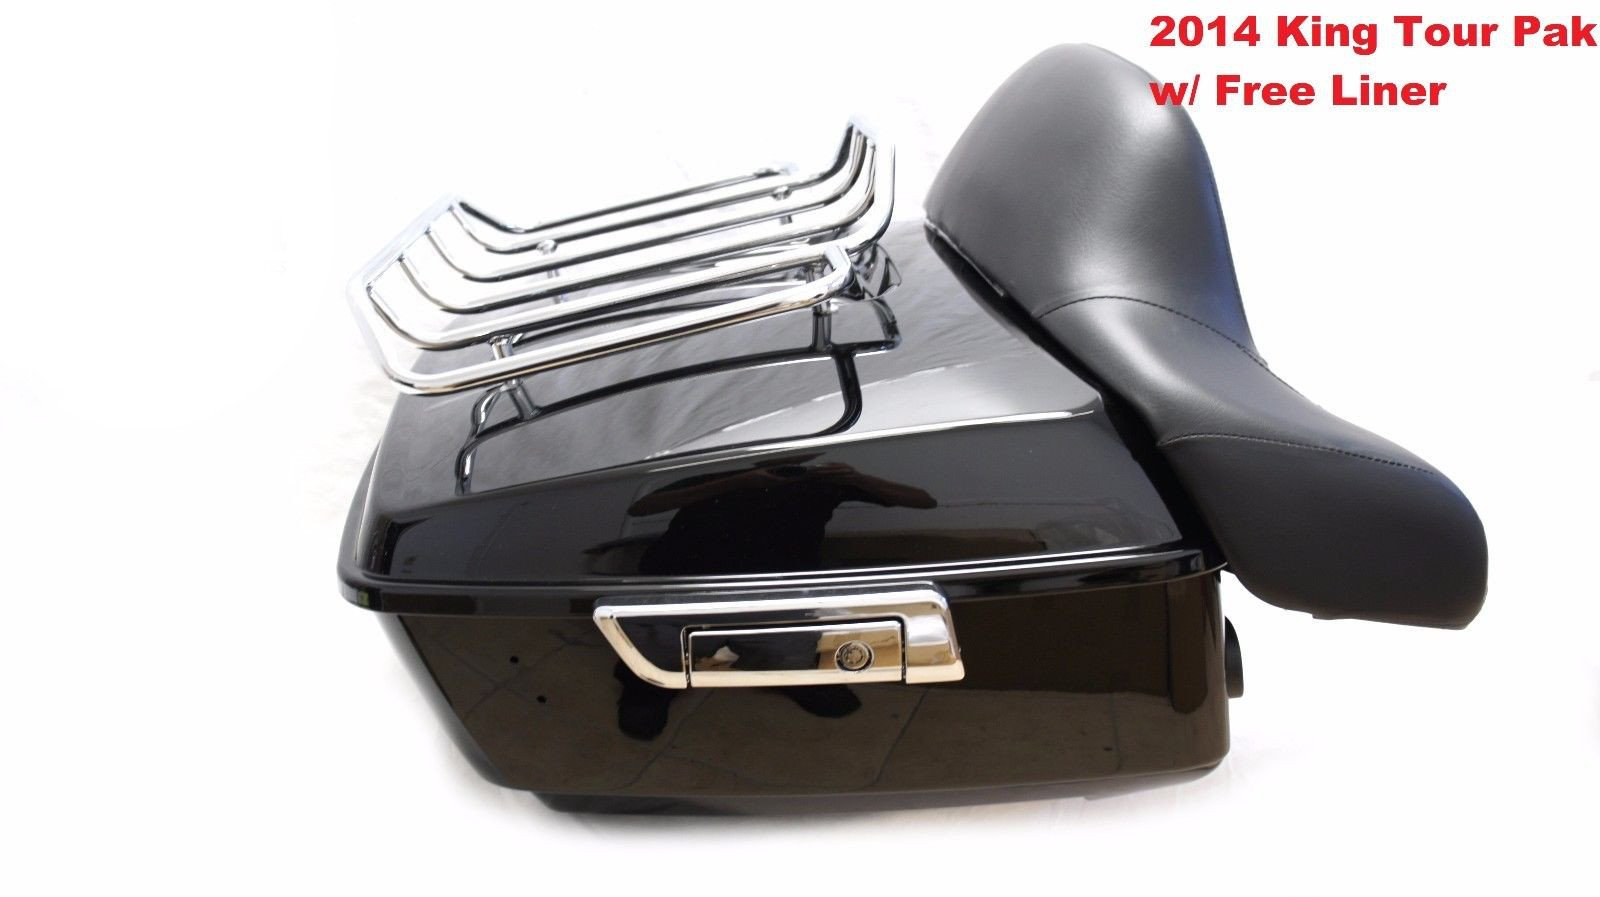 King Tour Pak Pack Trunk W/ Rack Backrest For Harley Street Road Glide 2014-2017